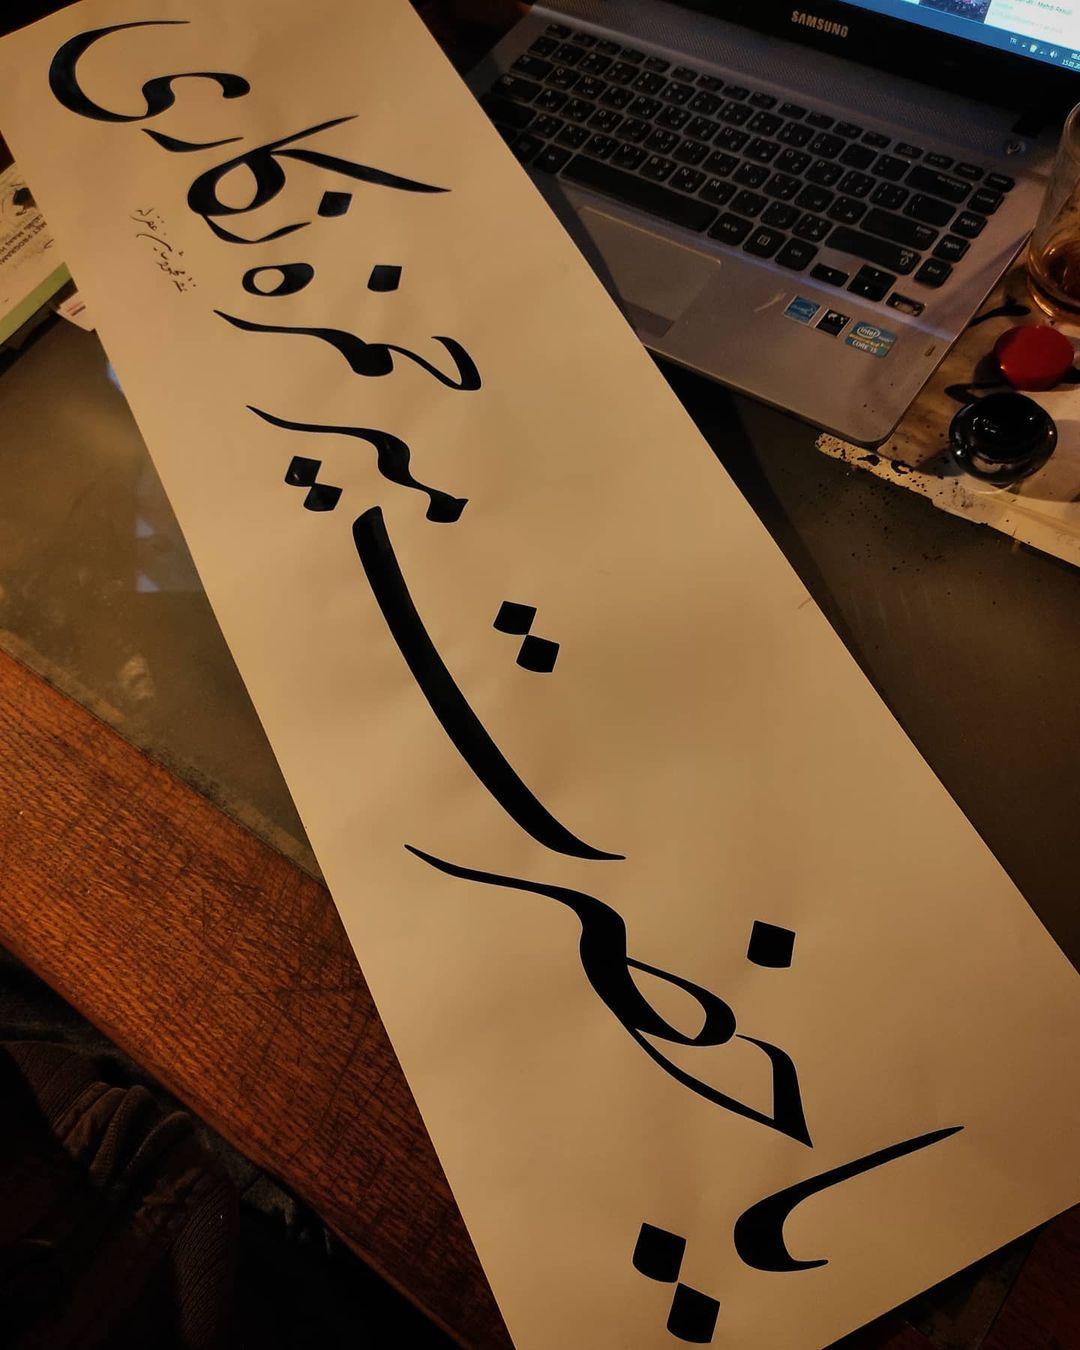 Donwload Photo Ya Hazreti Mir Hamza Nigari.... Amasyaya selam olsun cumanız mübarek olsun inşal...- Hattat Mahmud 1